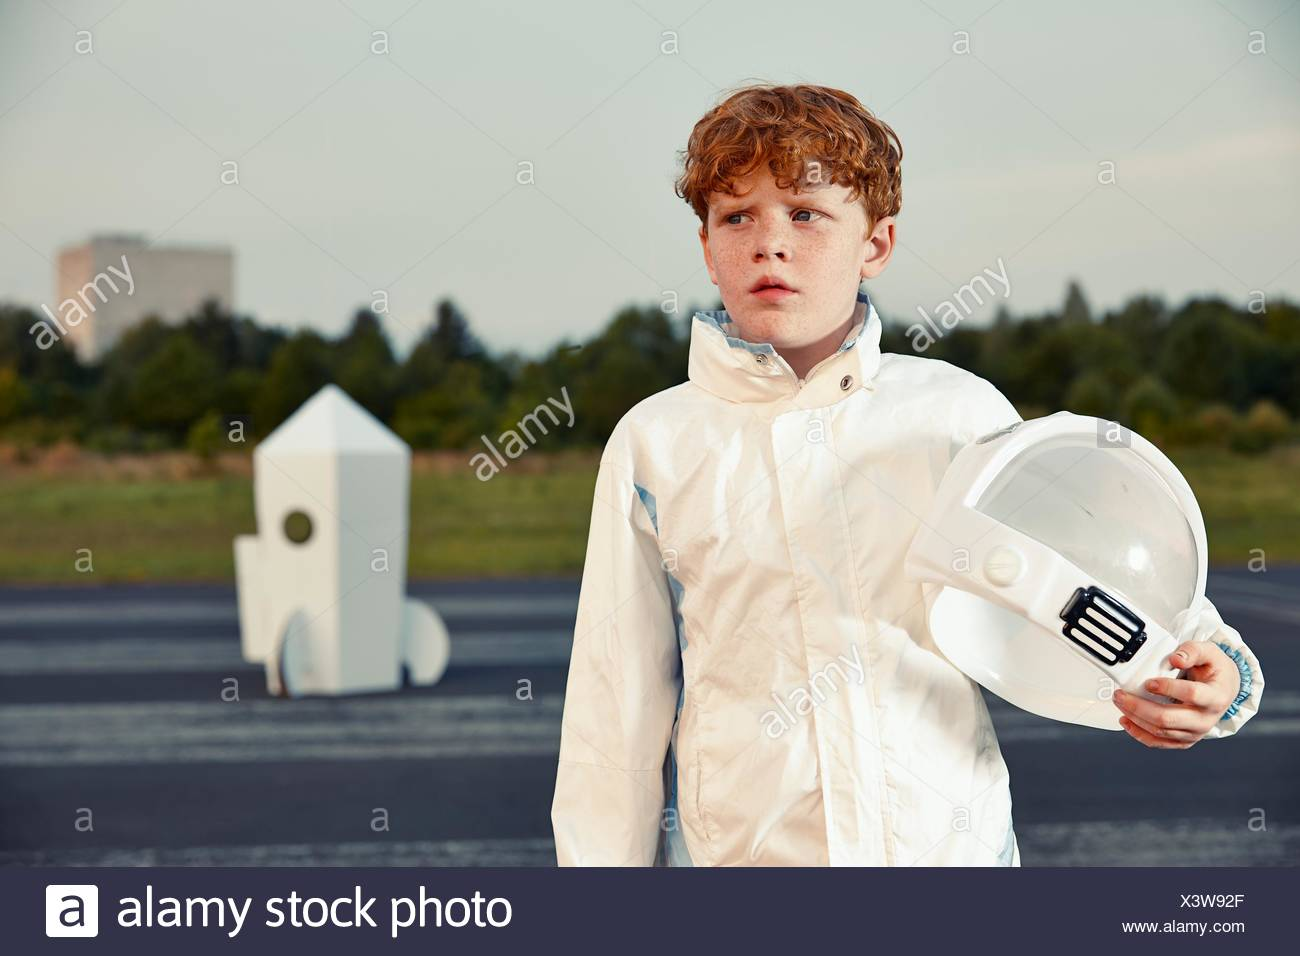 Rothaarige Junge verkleidet als Raumfahrer Stockbild